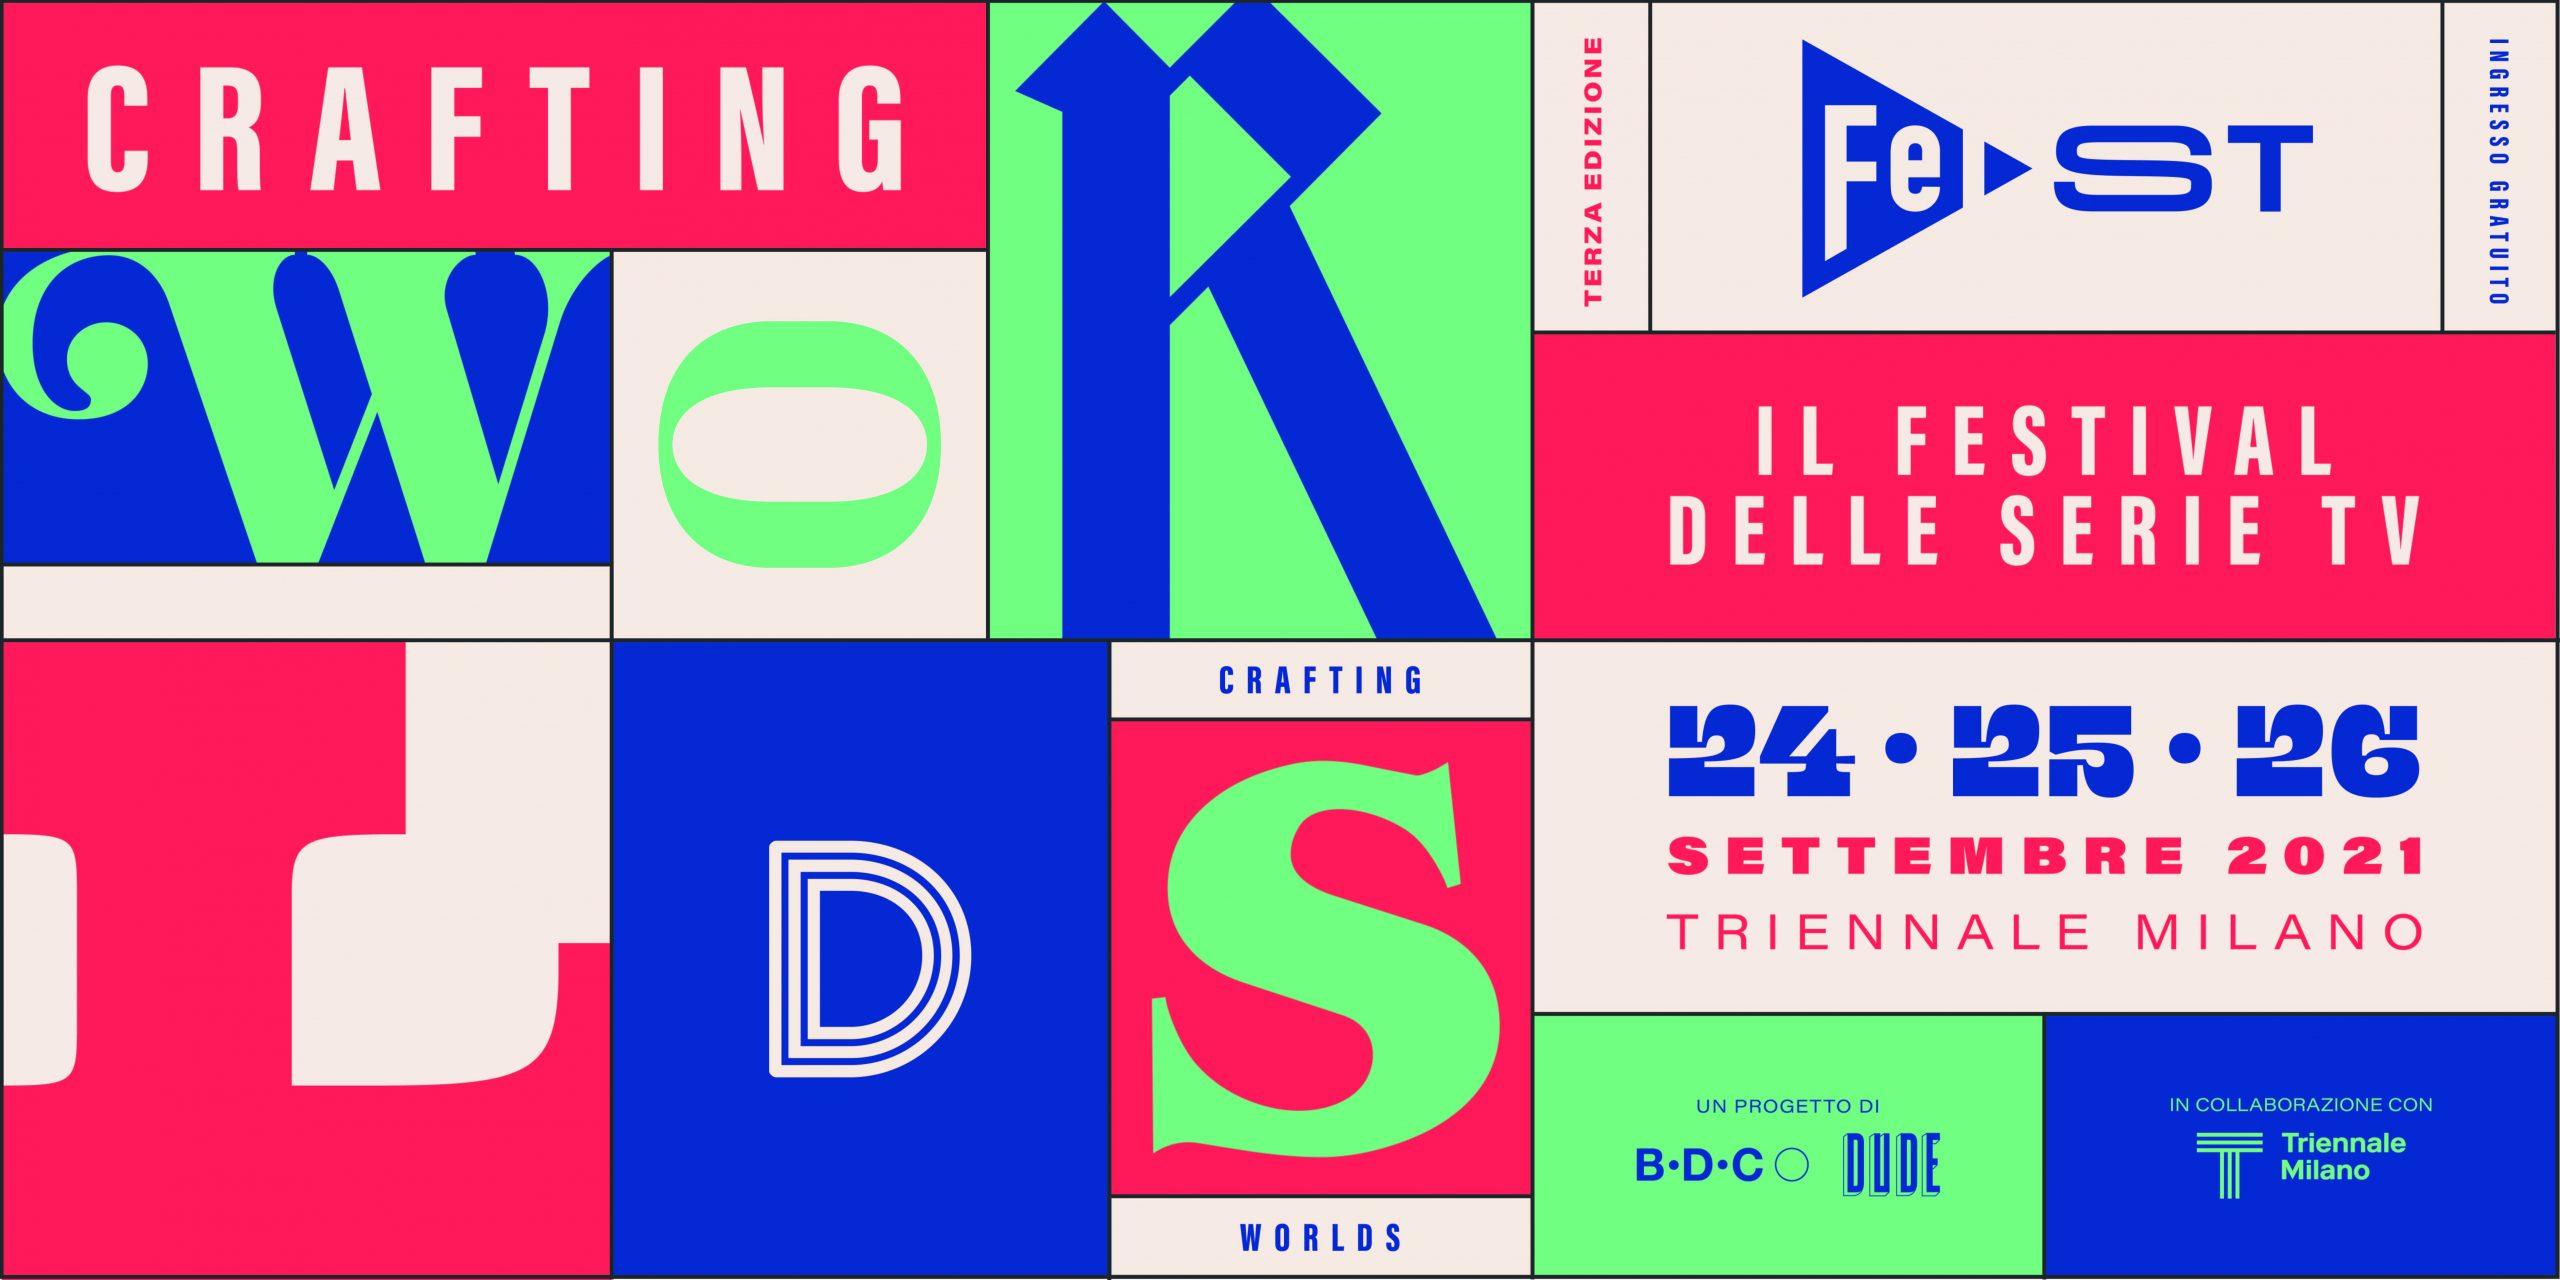 FeST - Il Festival delle serie Tv 2021